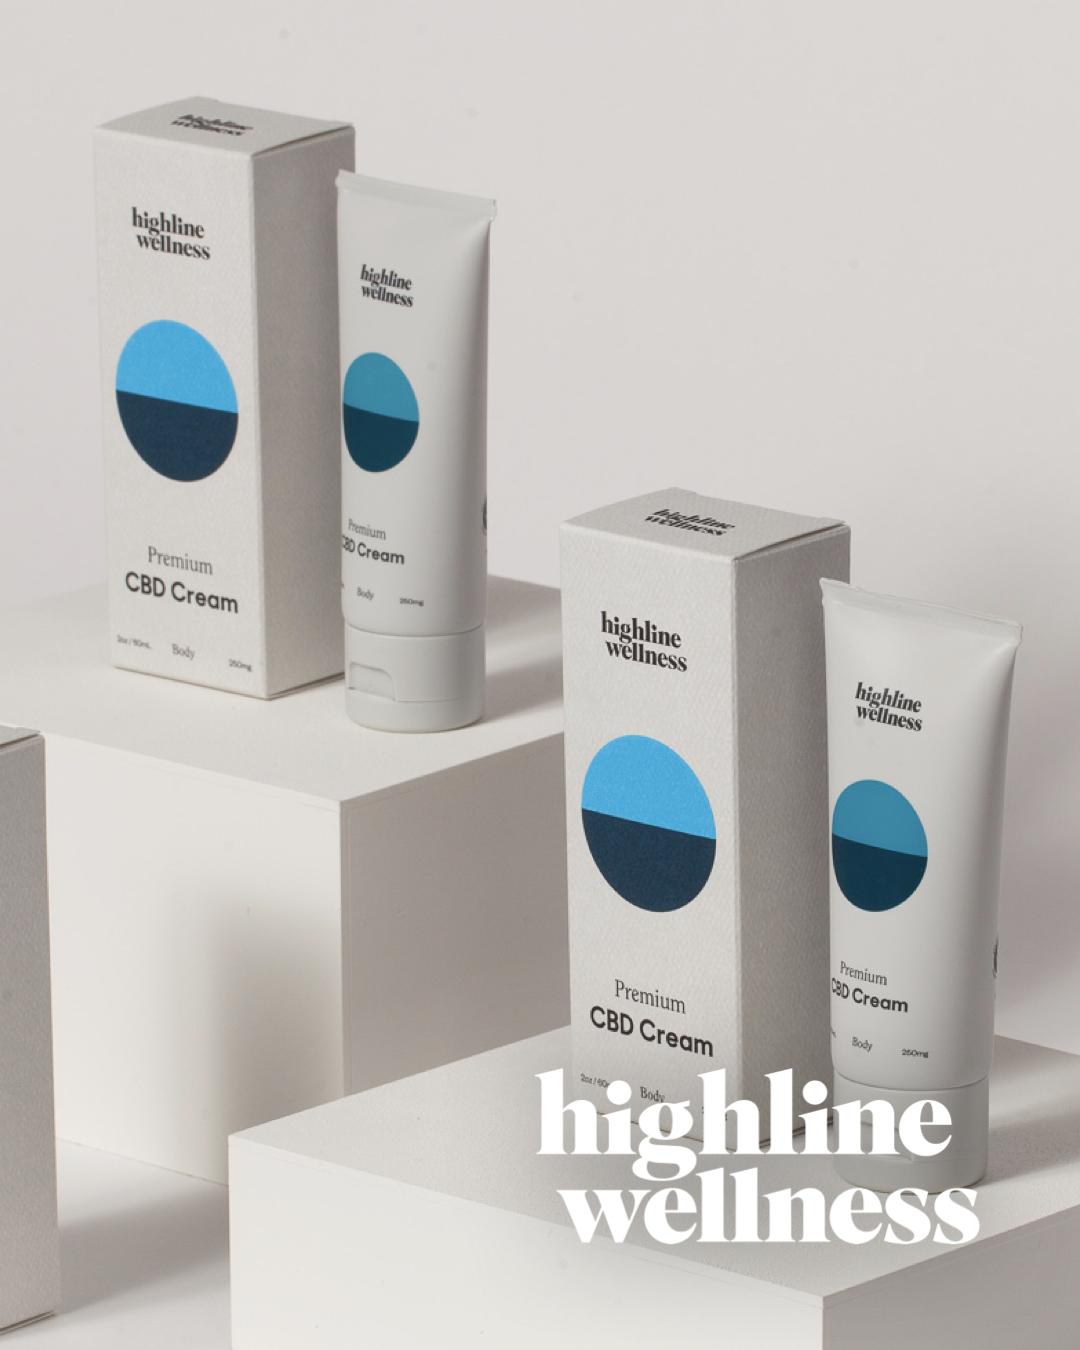 HighlineWellness_West 2019 - Headshots.001.jpeg